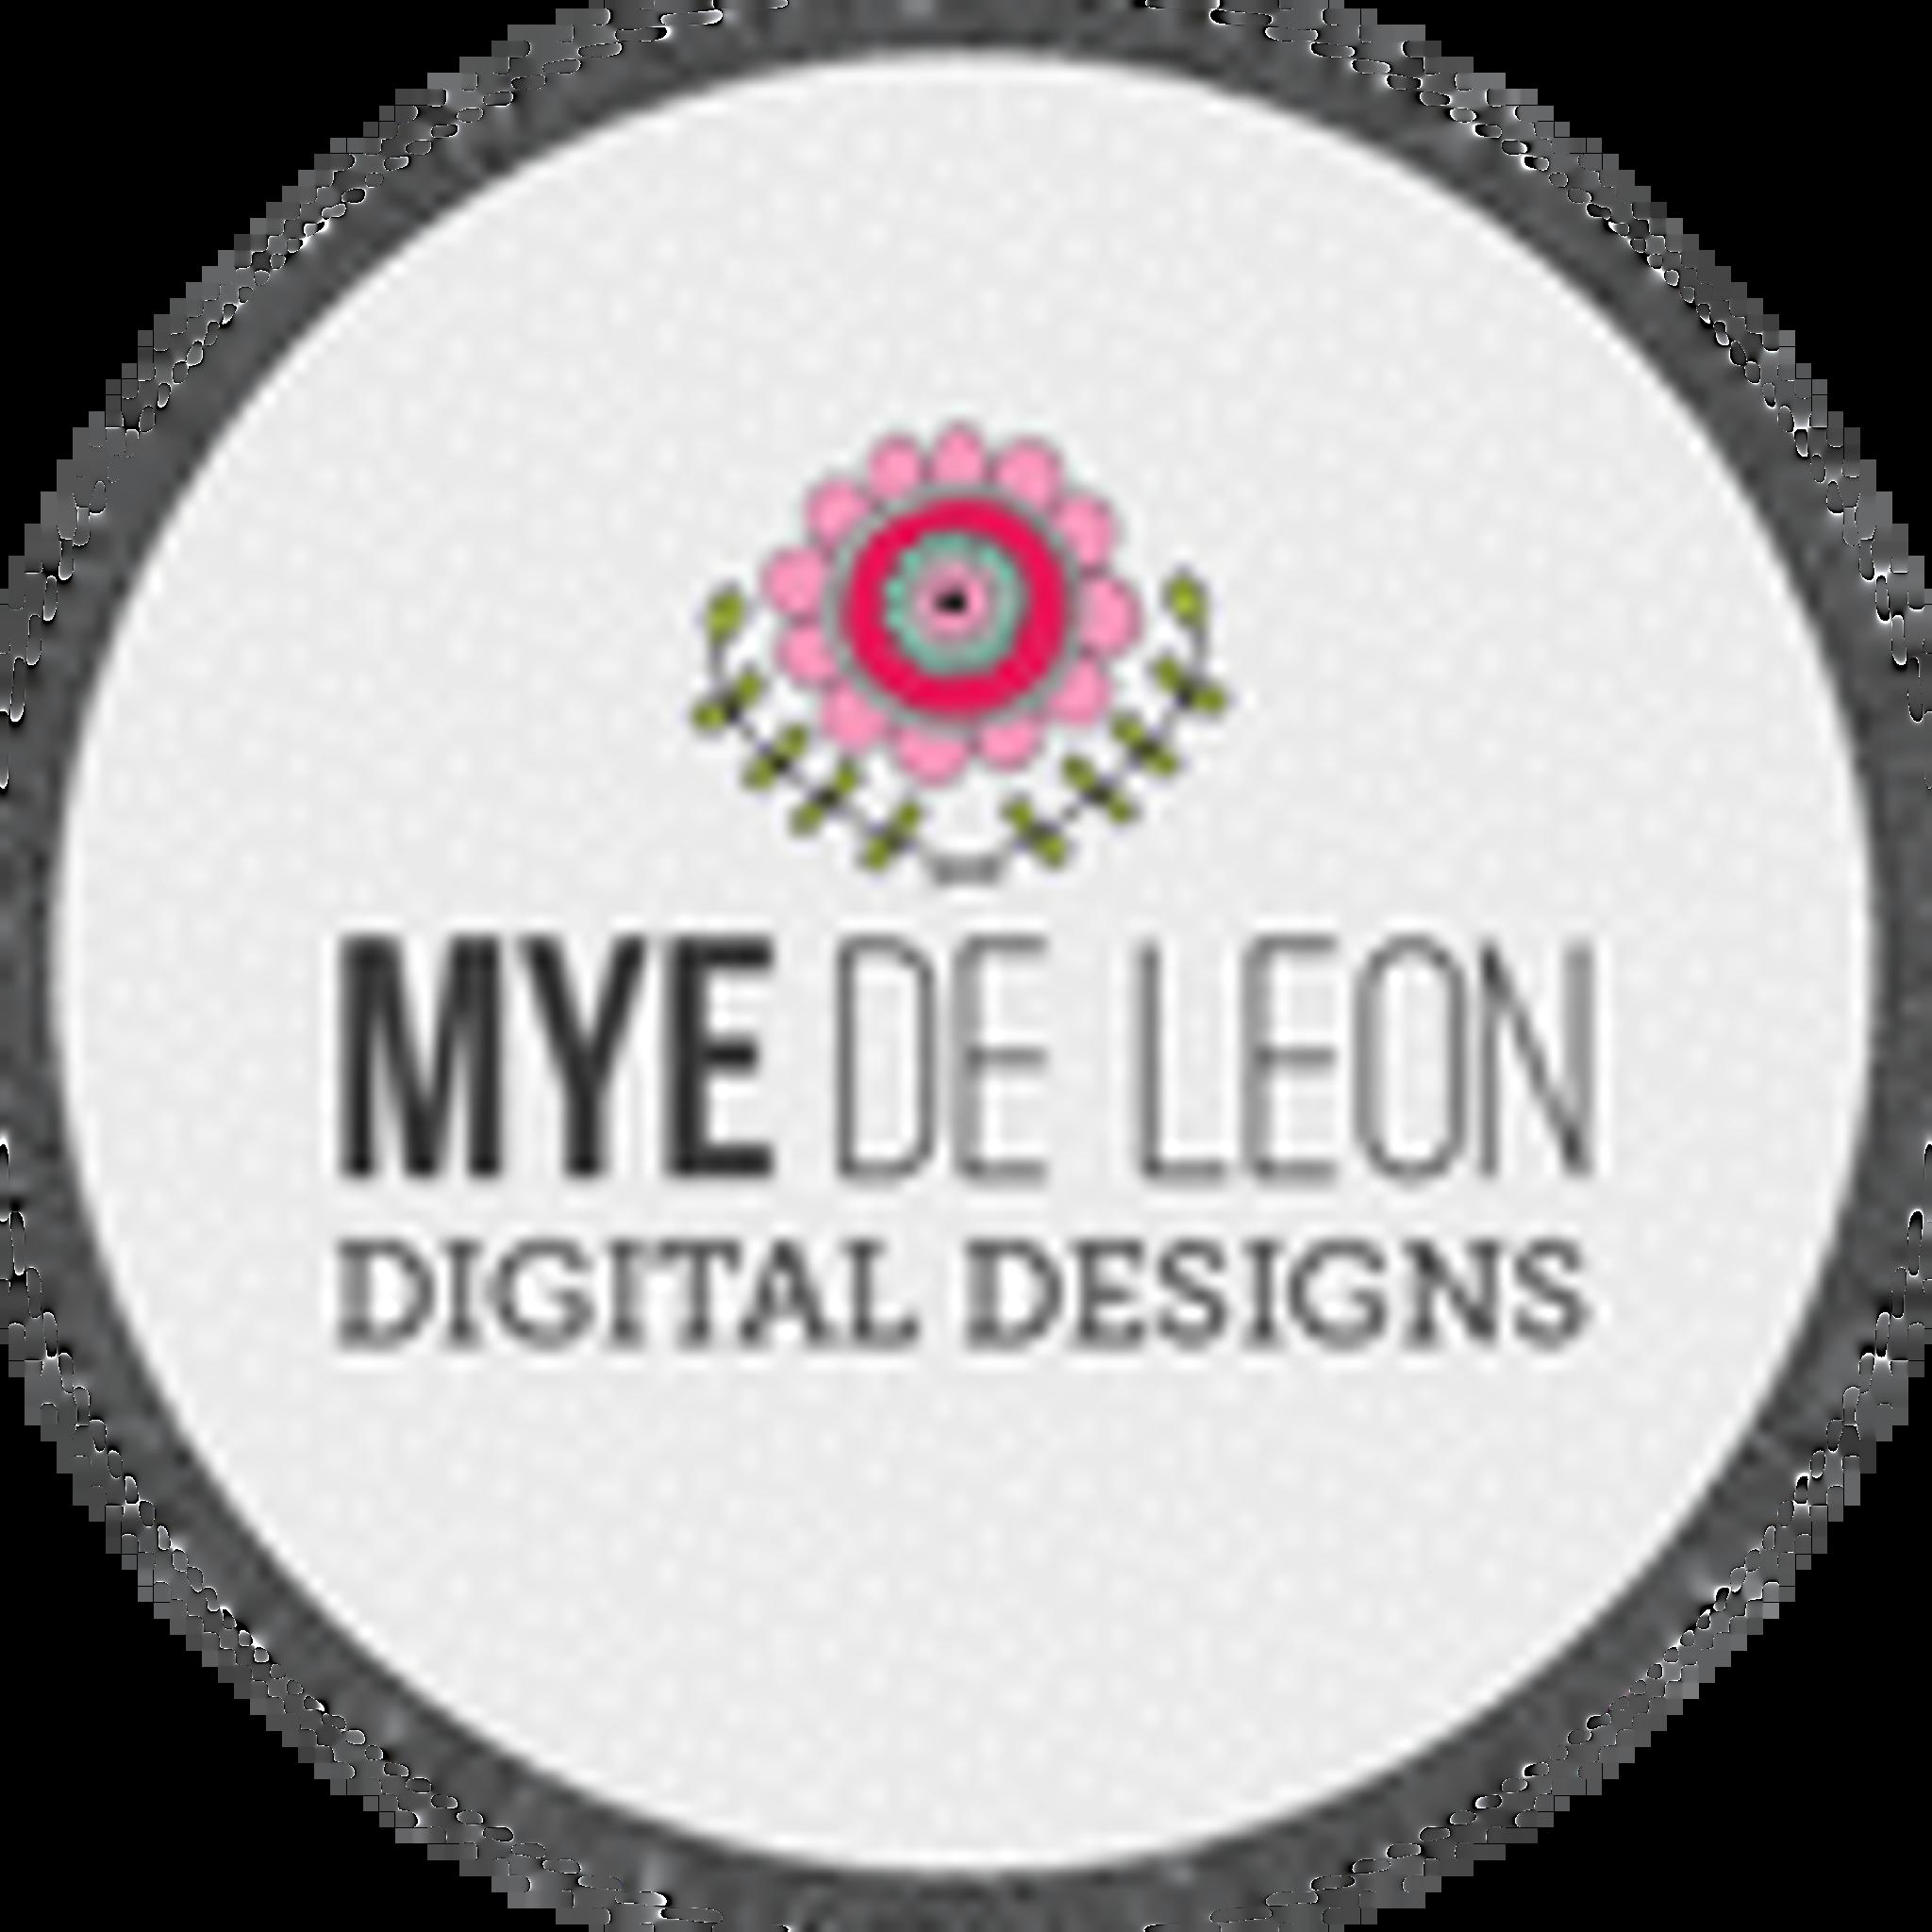 Mye De Leon